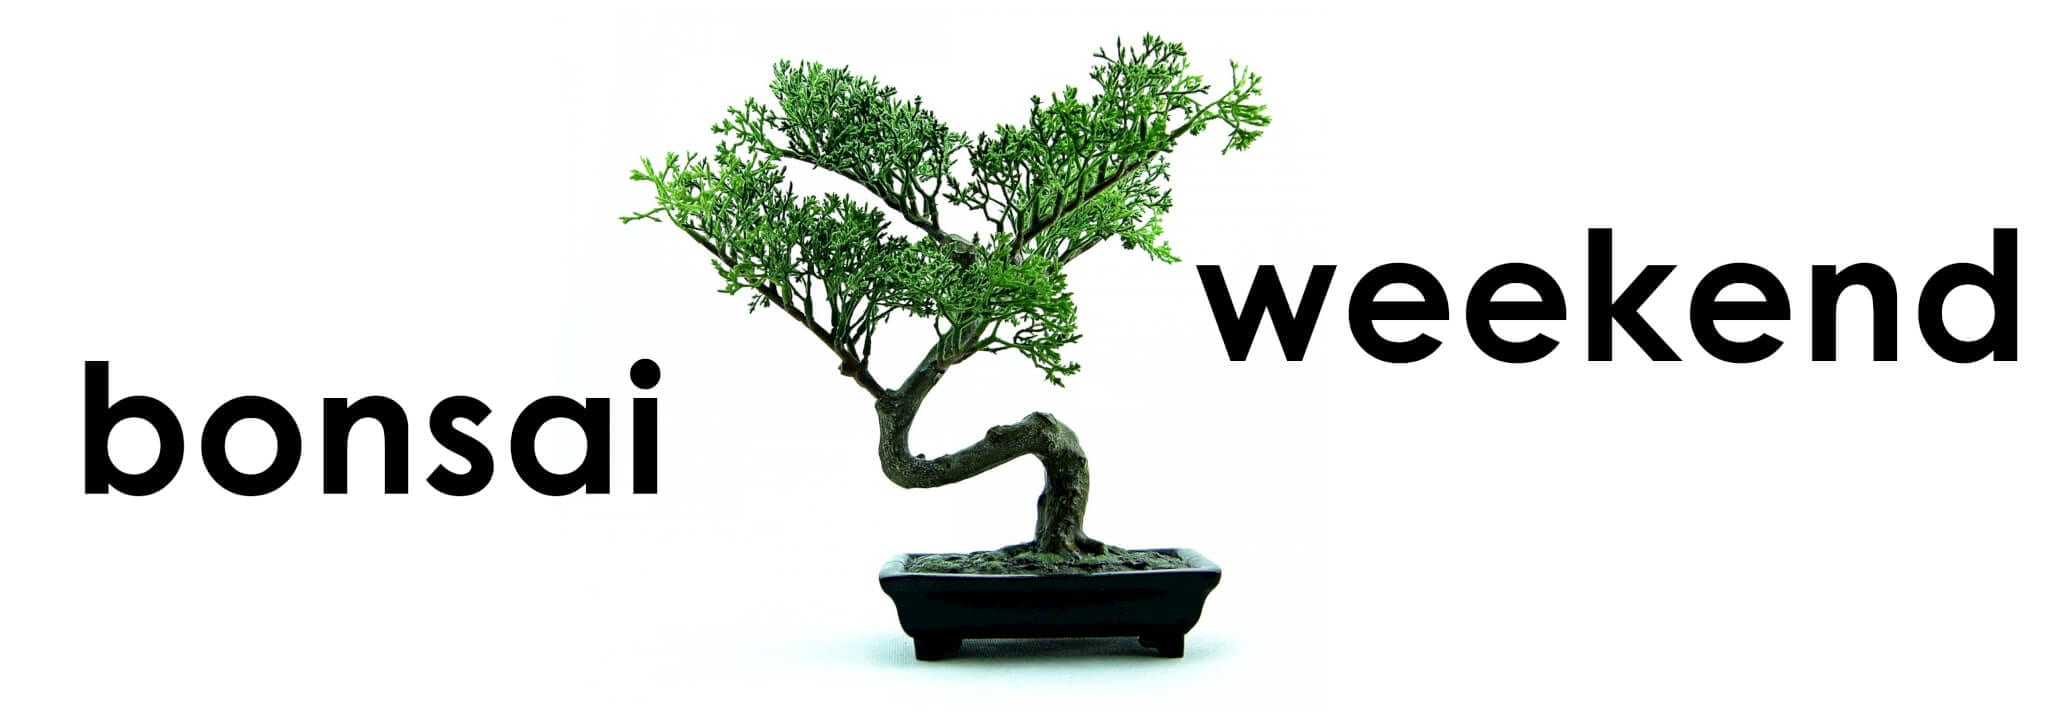 Bonsai Weekend logo